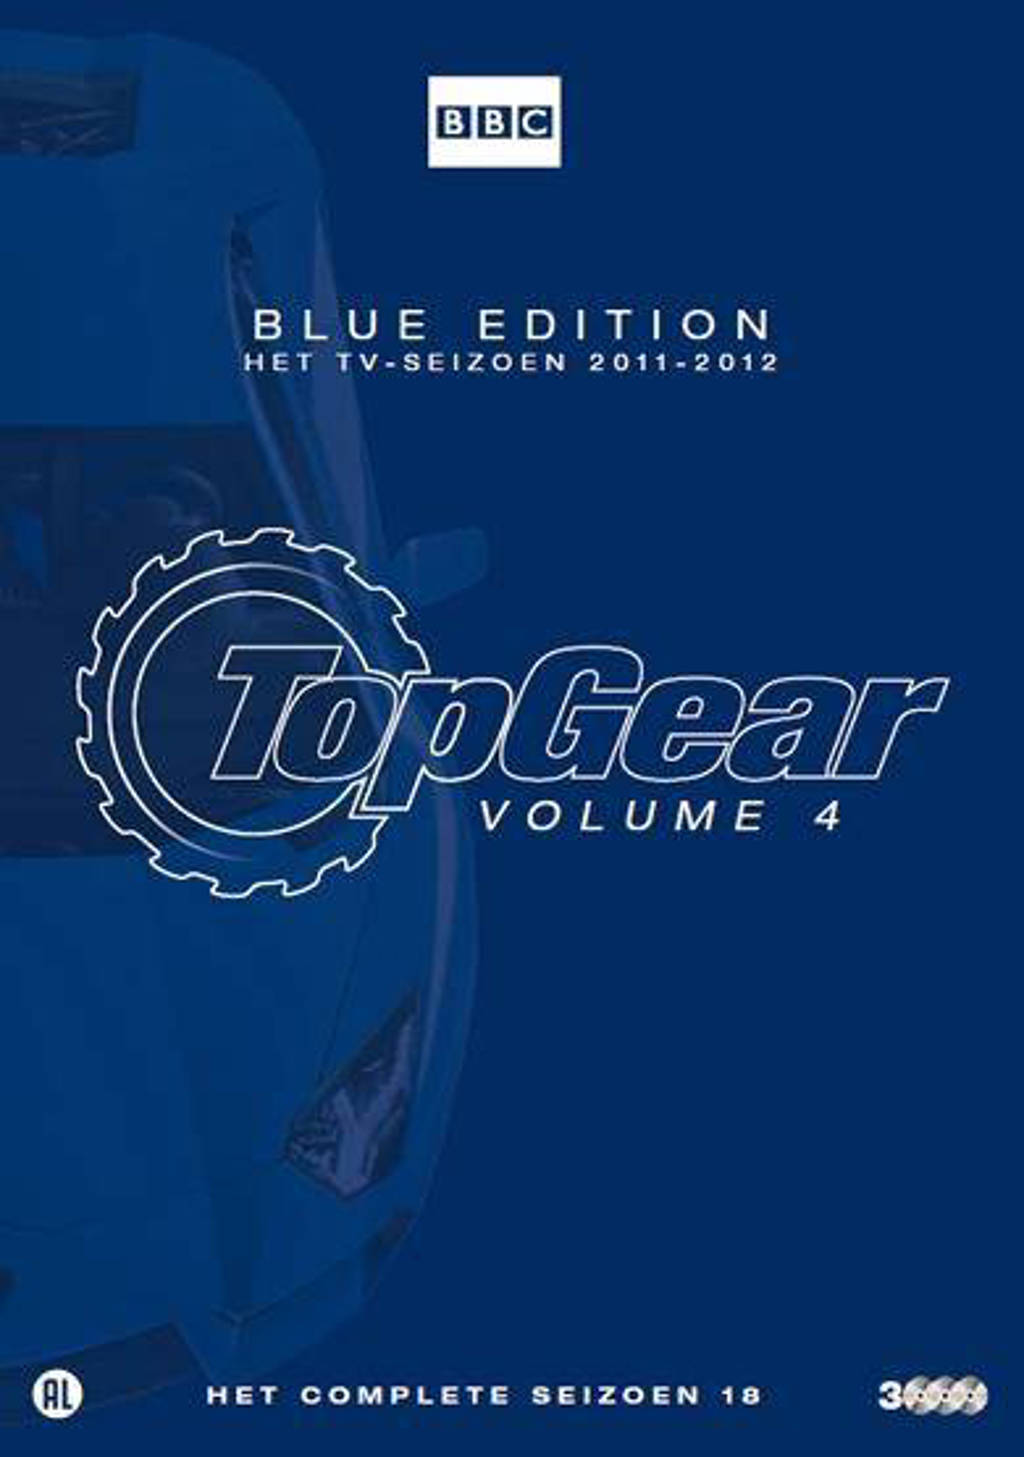 Top gear 4 - Seizoen 2011-2012 (DVD)